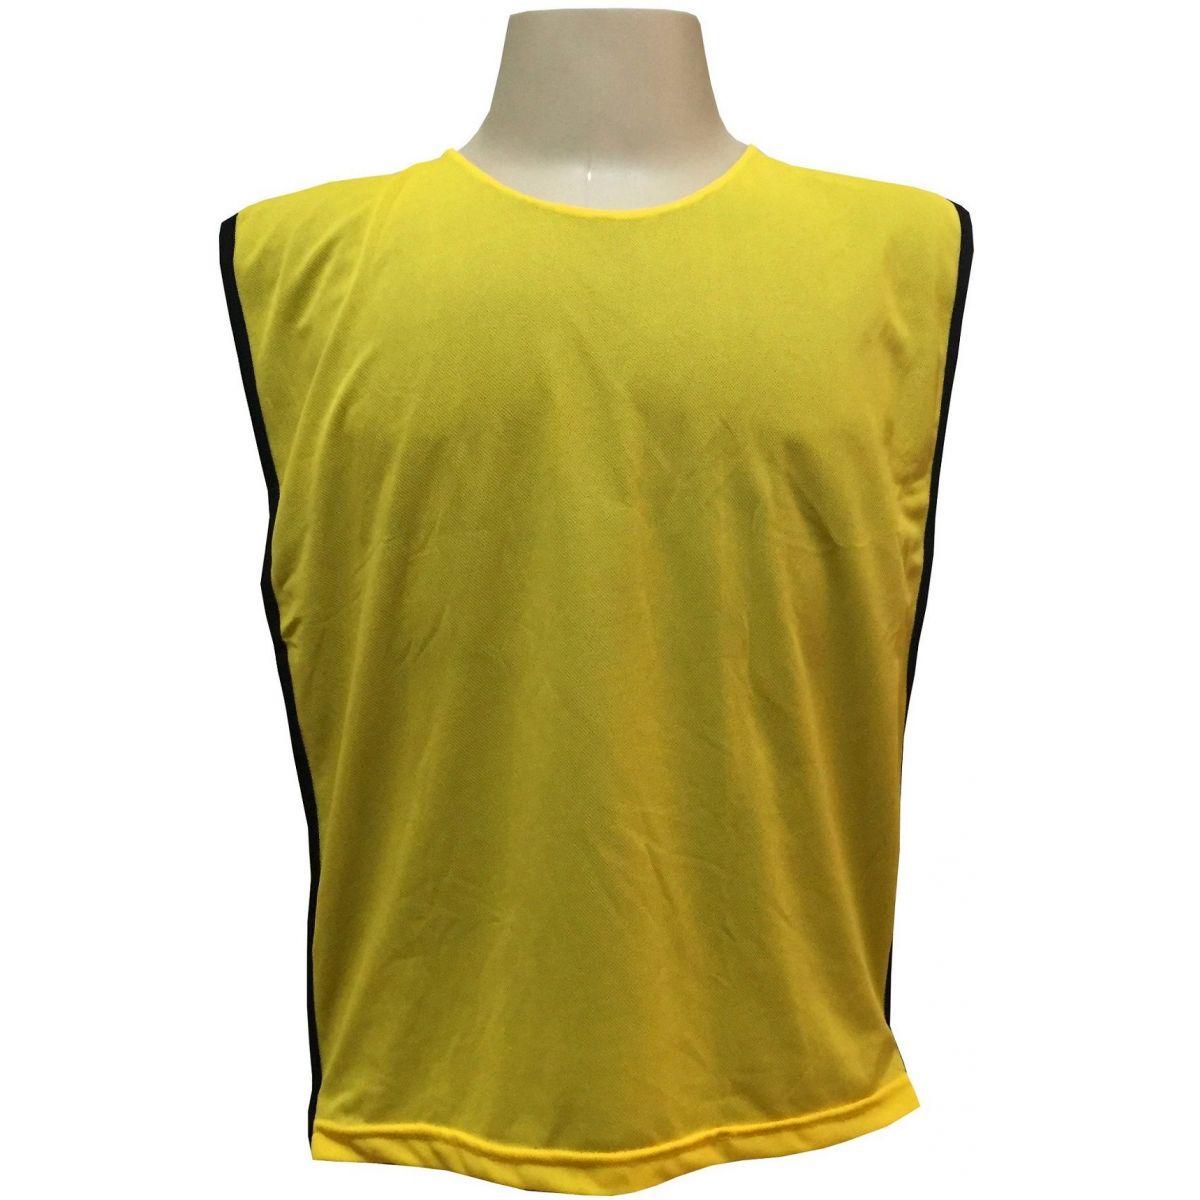 Jogo de Coletes Dupla Face 10 Unidades na cor Amarelo/Preto